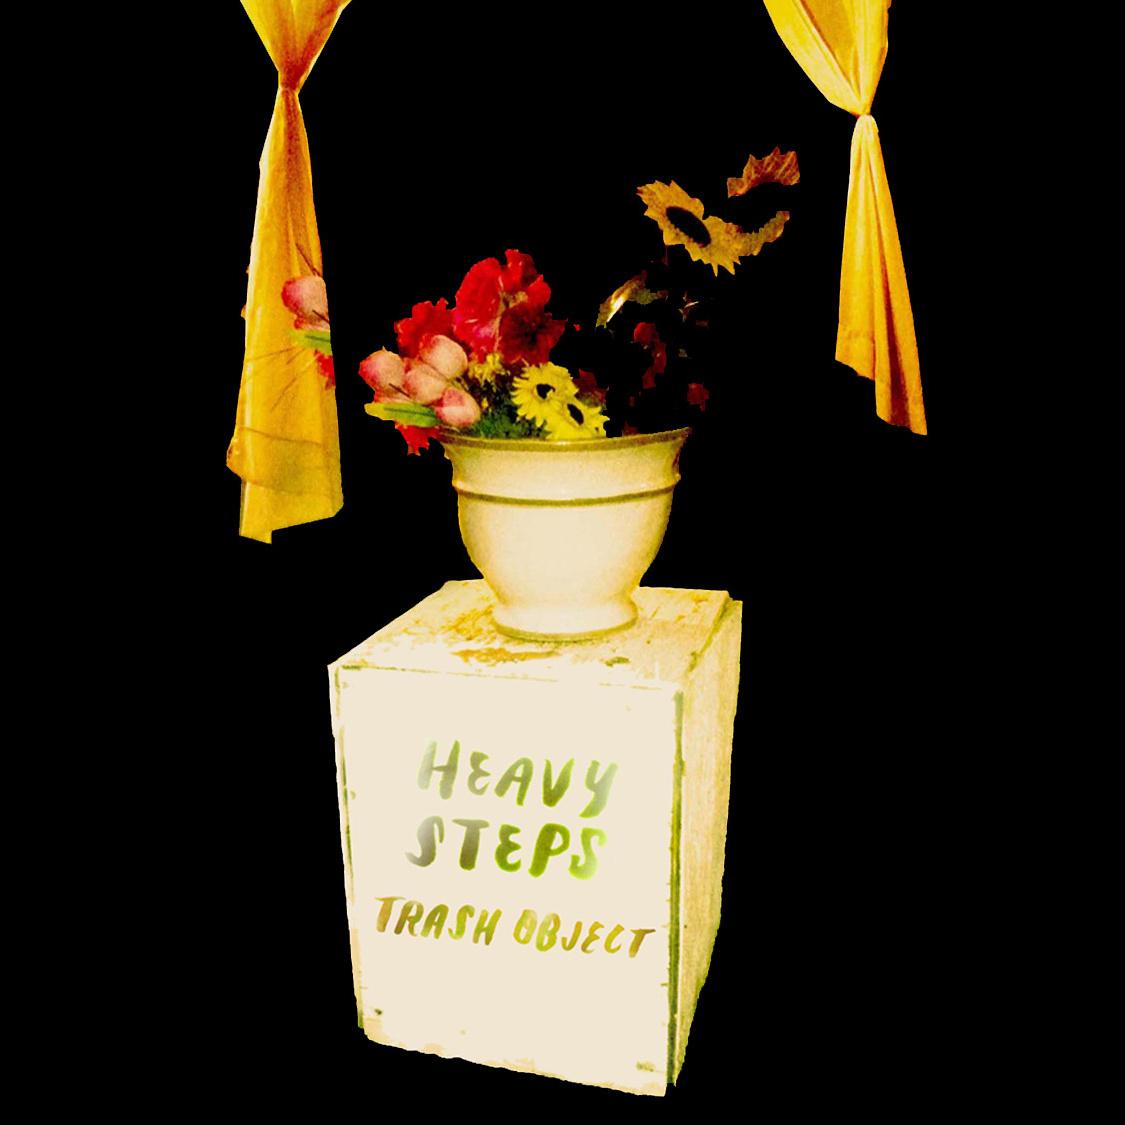 Heavy Steps Trash Object